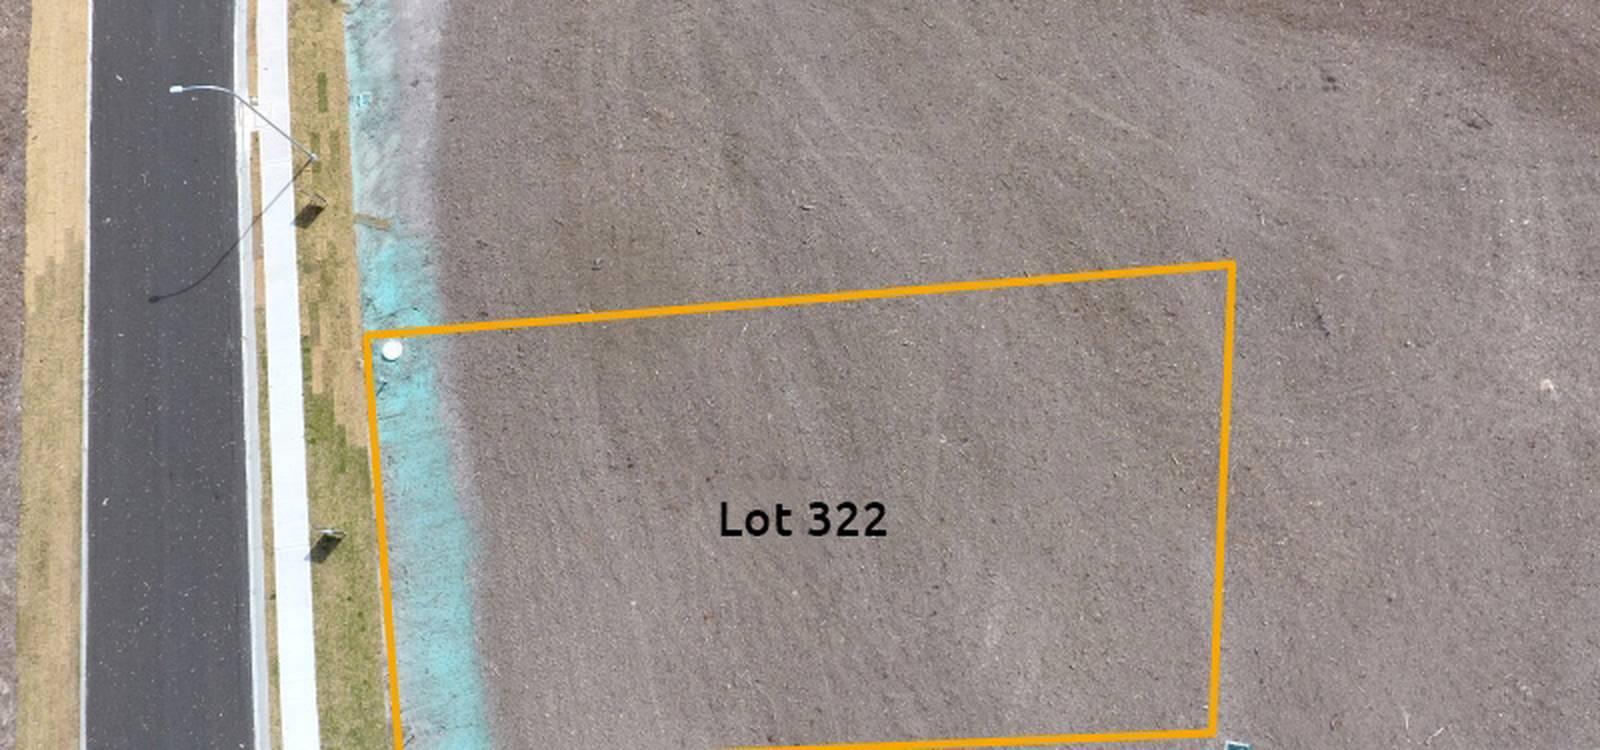 Lot 322 Throsby Crescent SUNSHINE BAY, NSW 2536 - photo 1